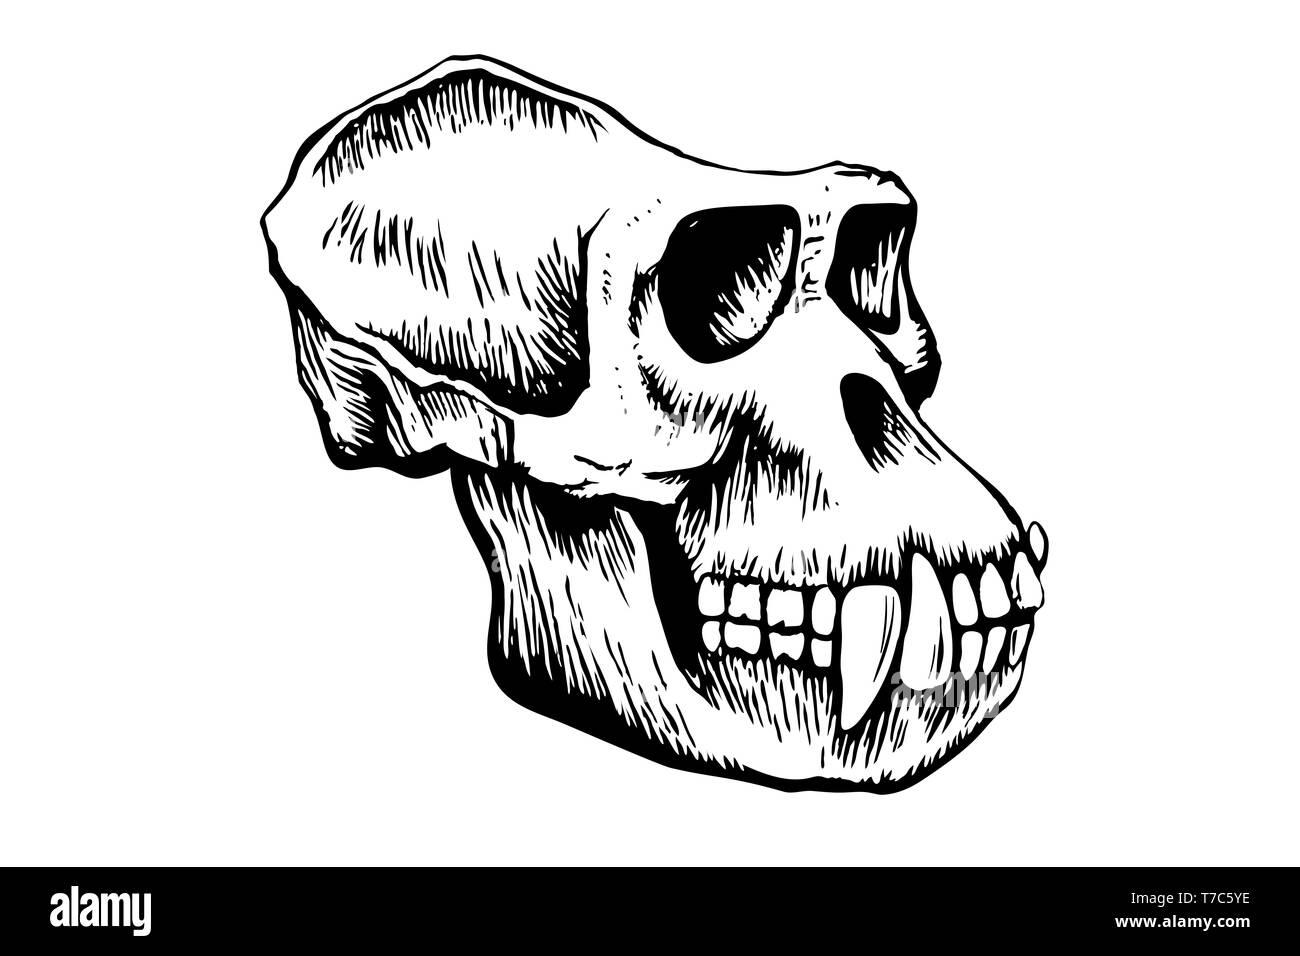 Gorilla monkey skull, hand-drawn sketch isolated on white background. illustration Stock Photo